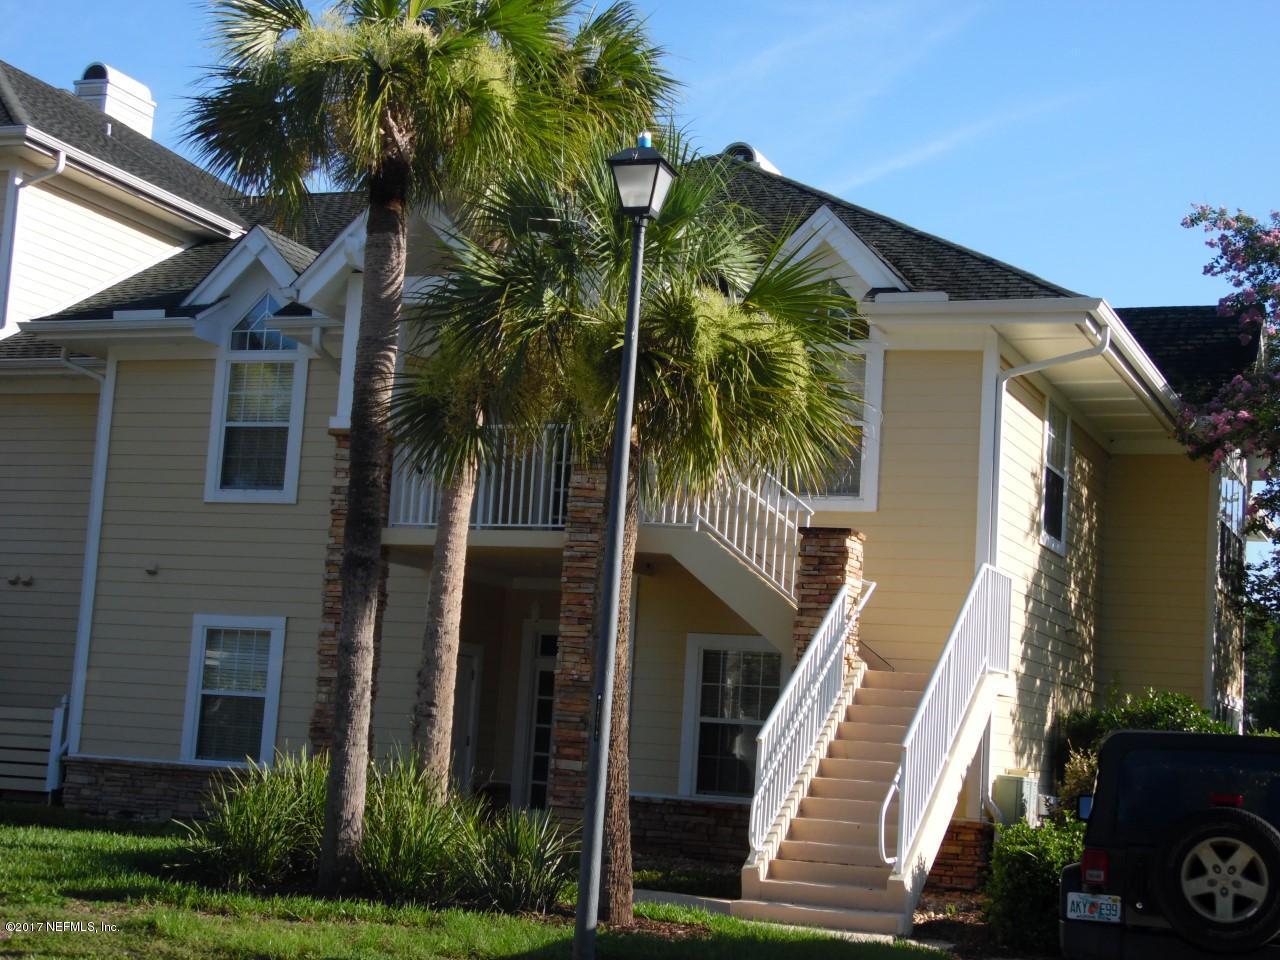 355 N SHORE, ST AUGUSTINE, FLORIDA 32092, 4 Bedrooms Bedrooms, ,4 BathroomsBathrooms,Residential - condos/townhomes,For sale,N SHORE,894967